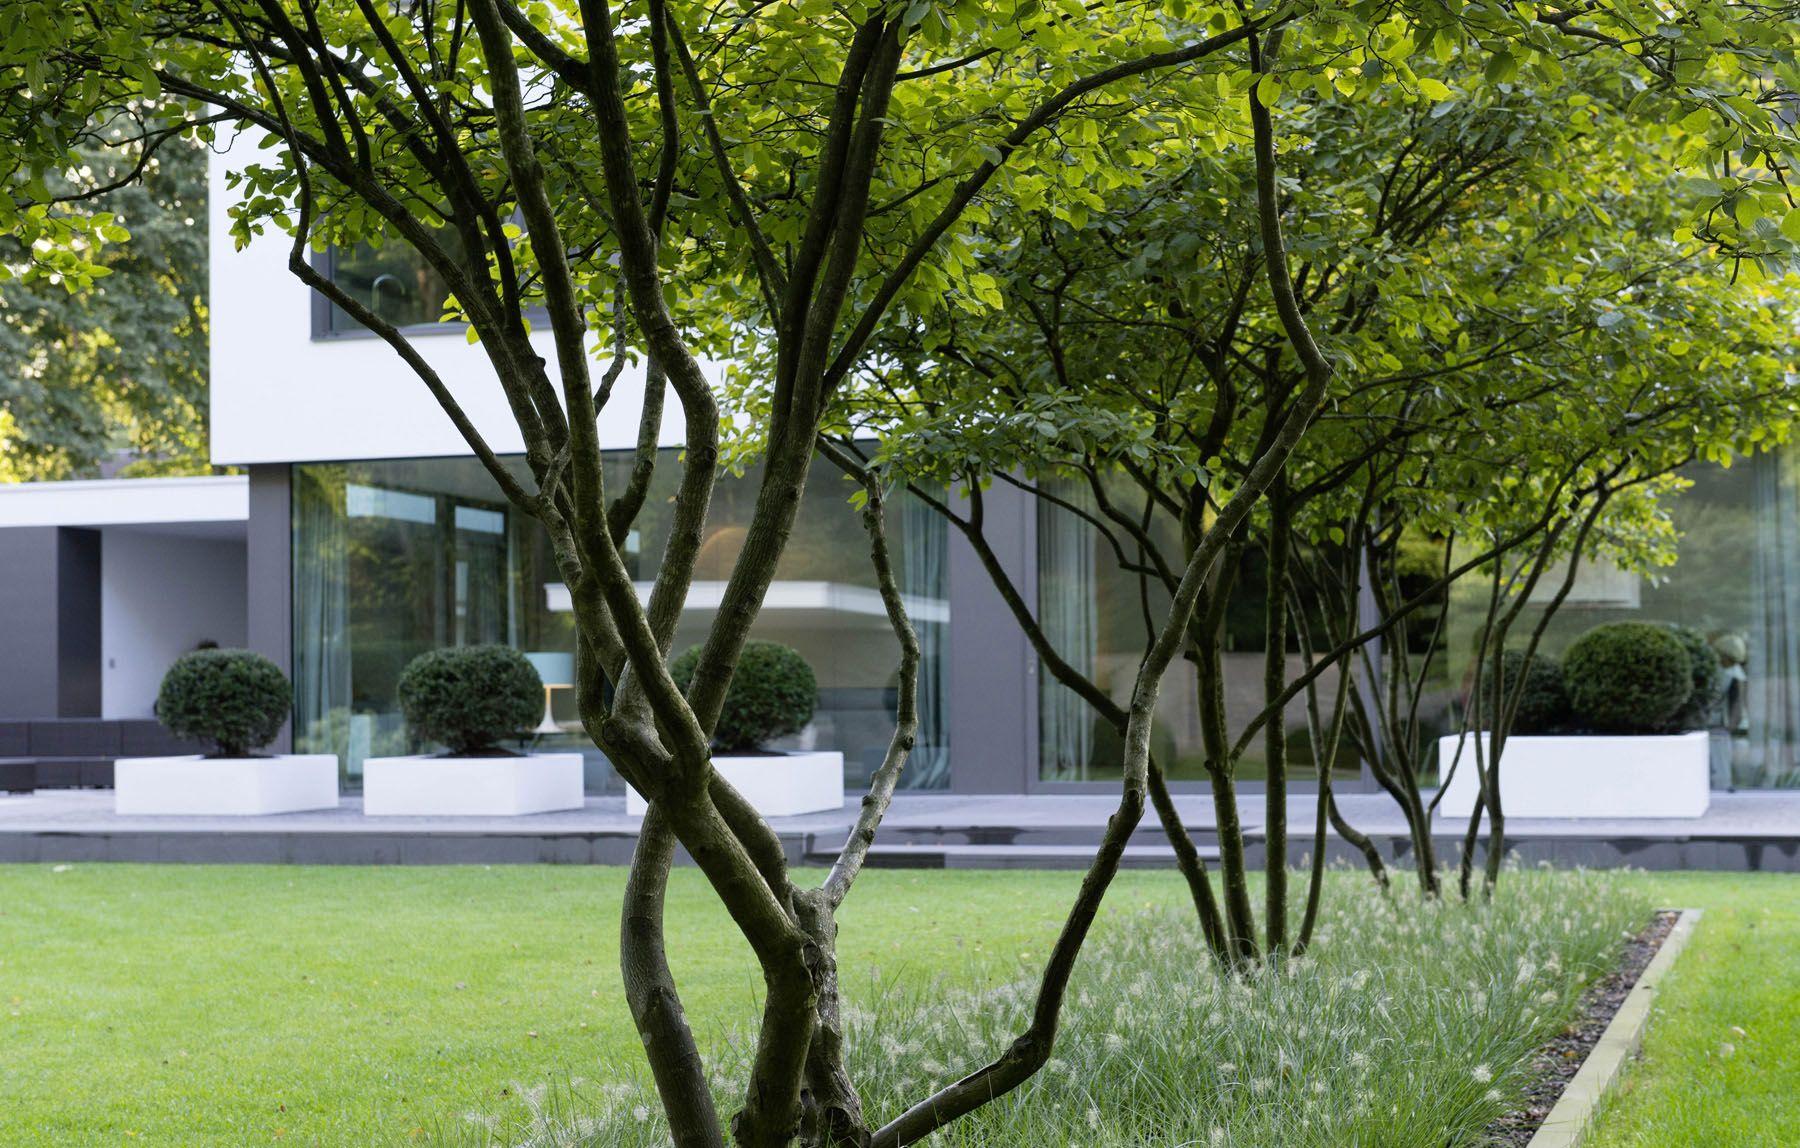 moderne gartenarchitektur köln- villengarten 1 - gartenplus - die ... - Gartenarchitektur